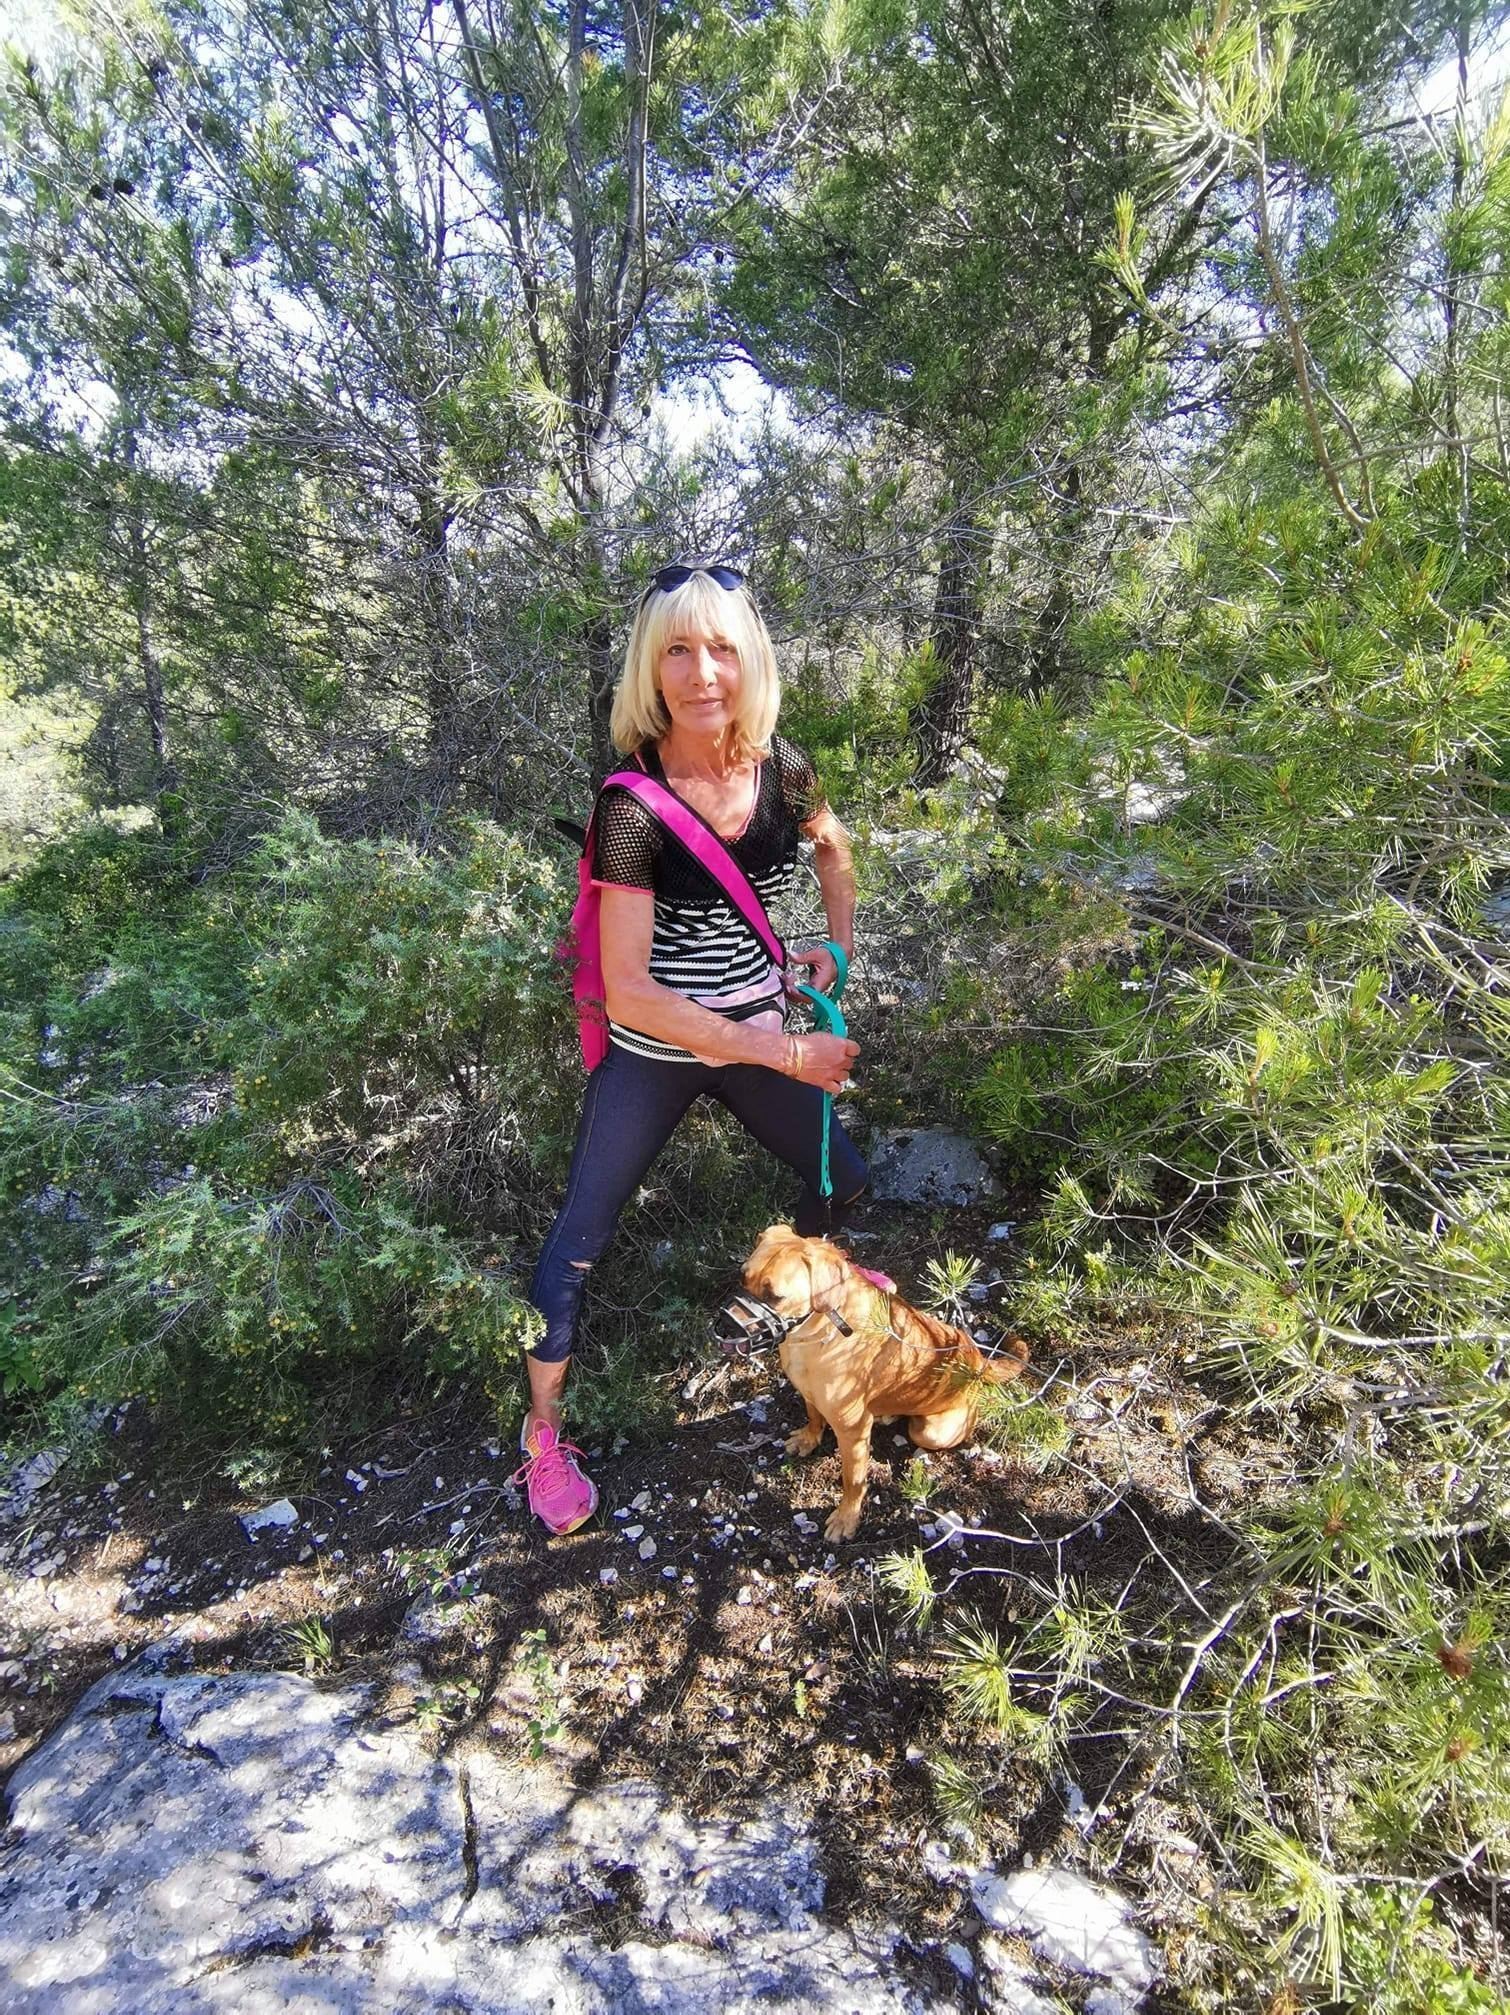 éducateur canin 34, educateur canin montpellier, educateru canin positif, spécialiste chien agressif